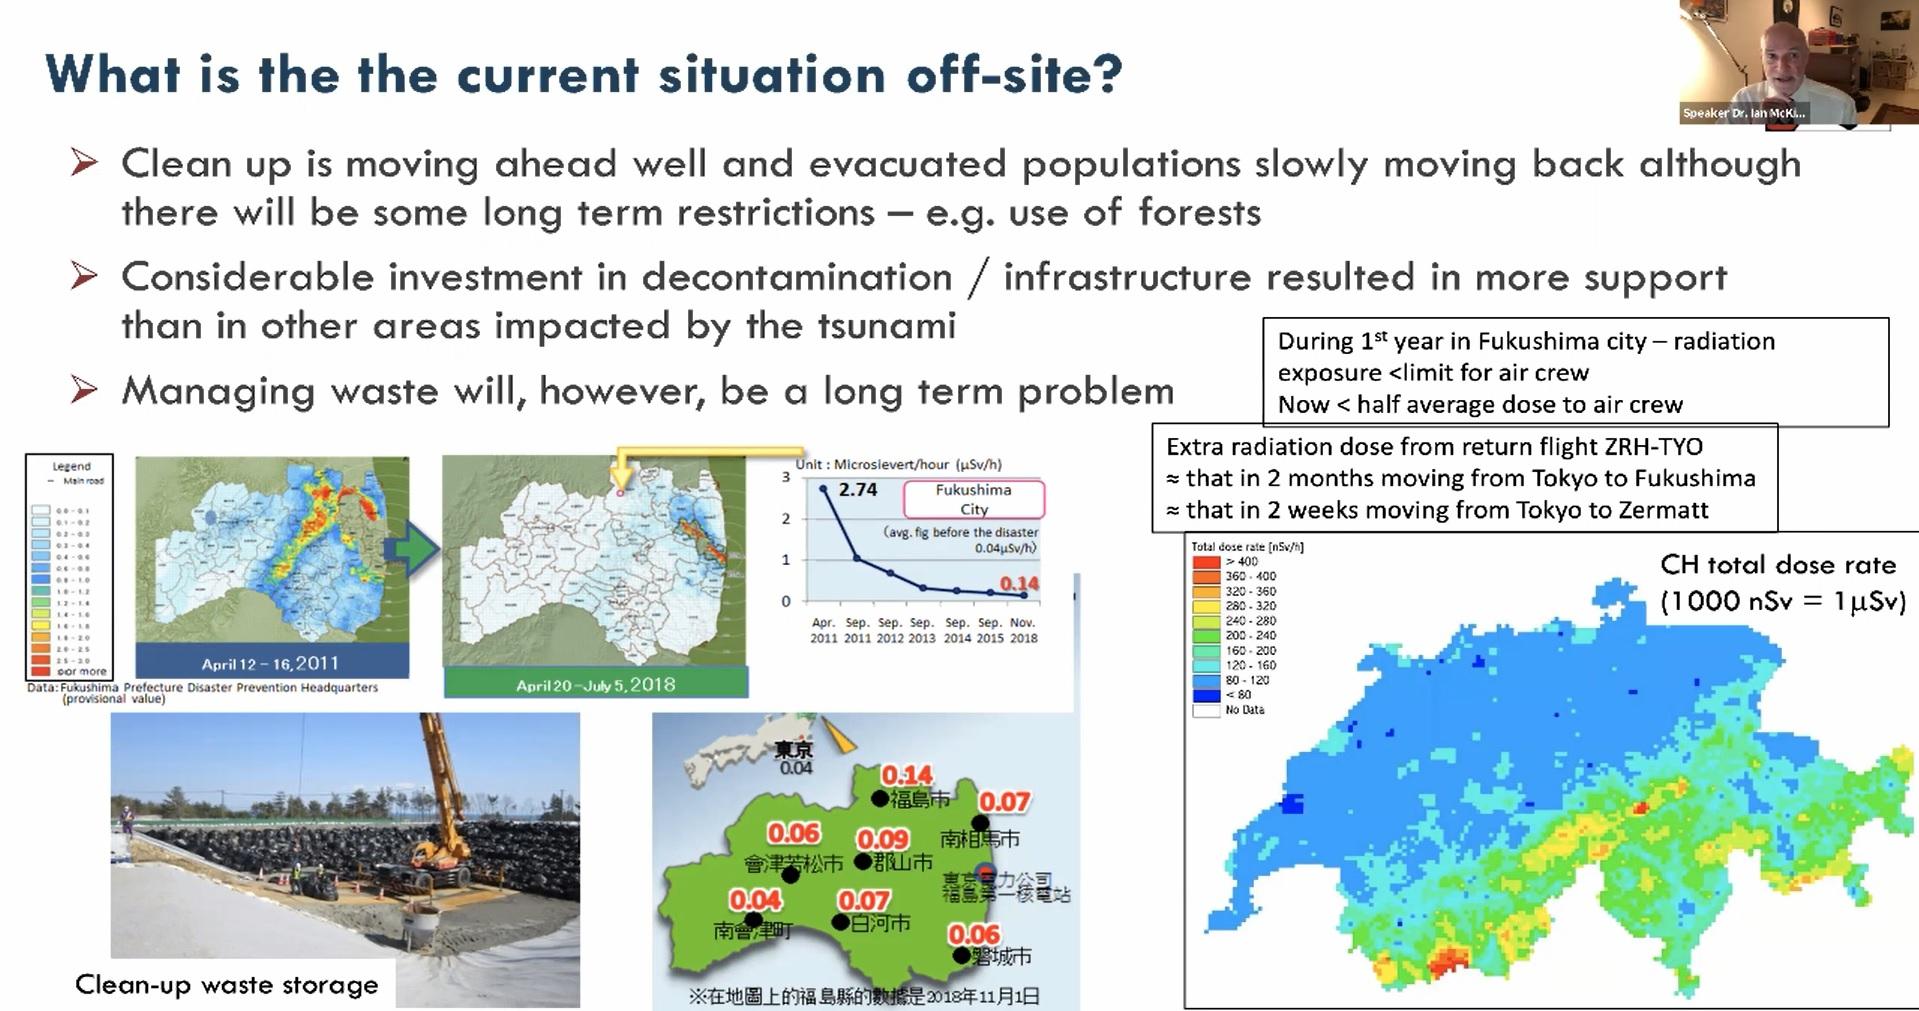 Webinar: An expert's perspective on Fukushima Daiichi